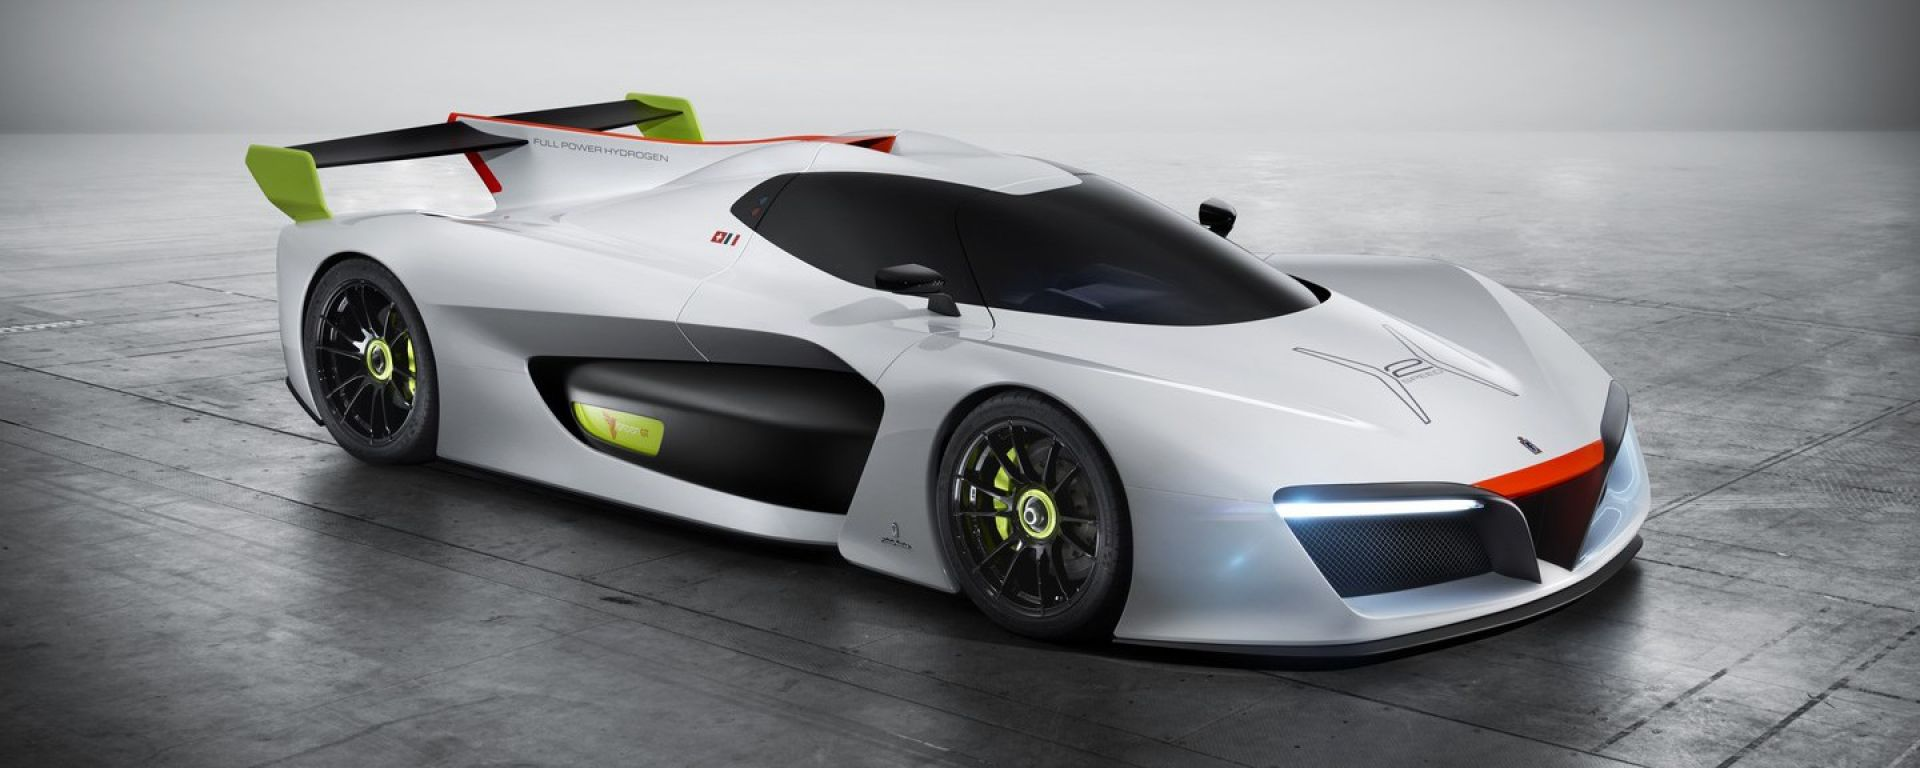 Pininfarina H2 Speed, sportiva a idrogeno